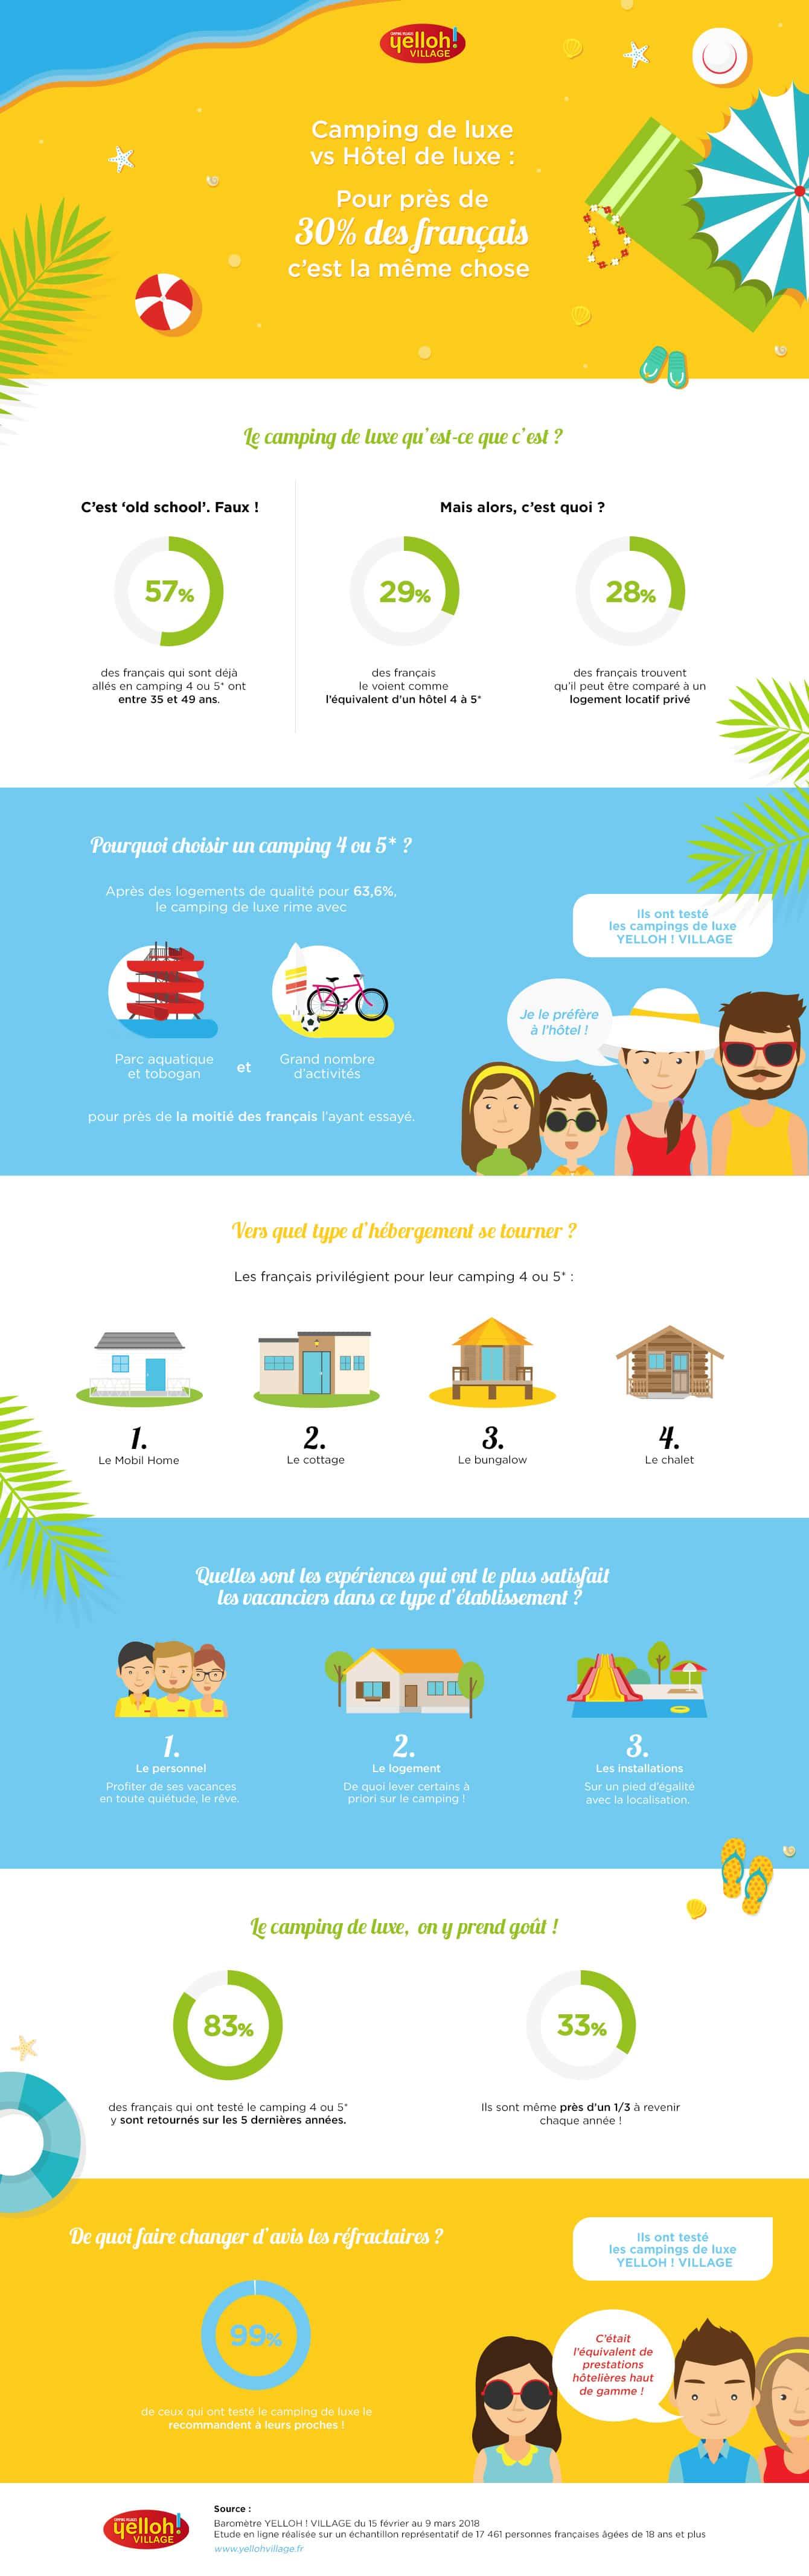 Infographie baromètre camping de luxe Yelloh! Village